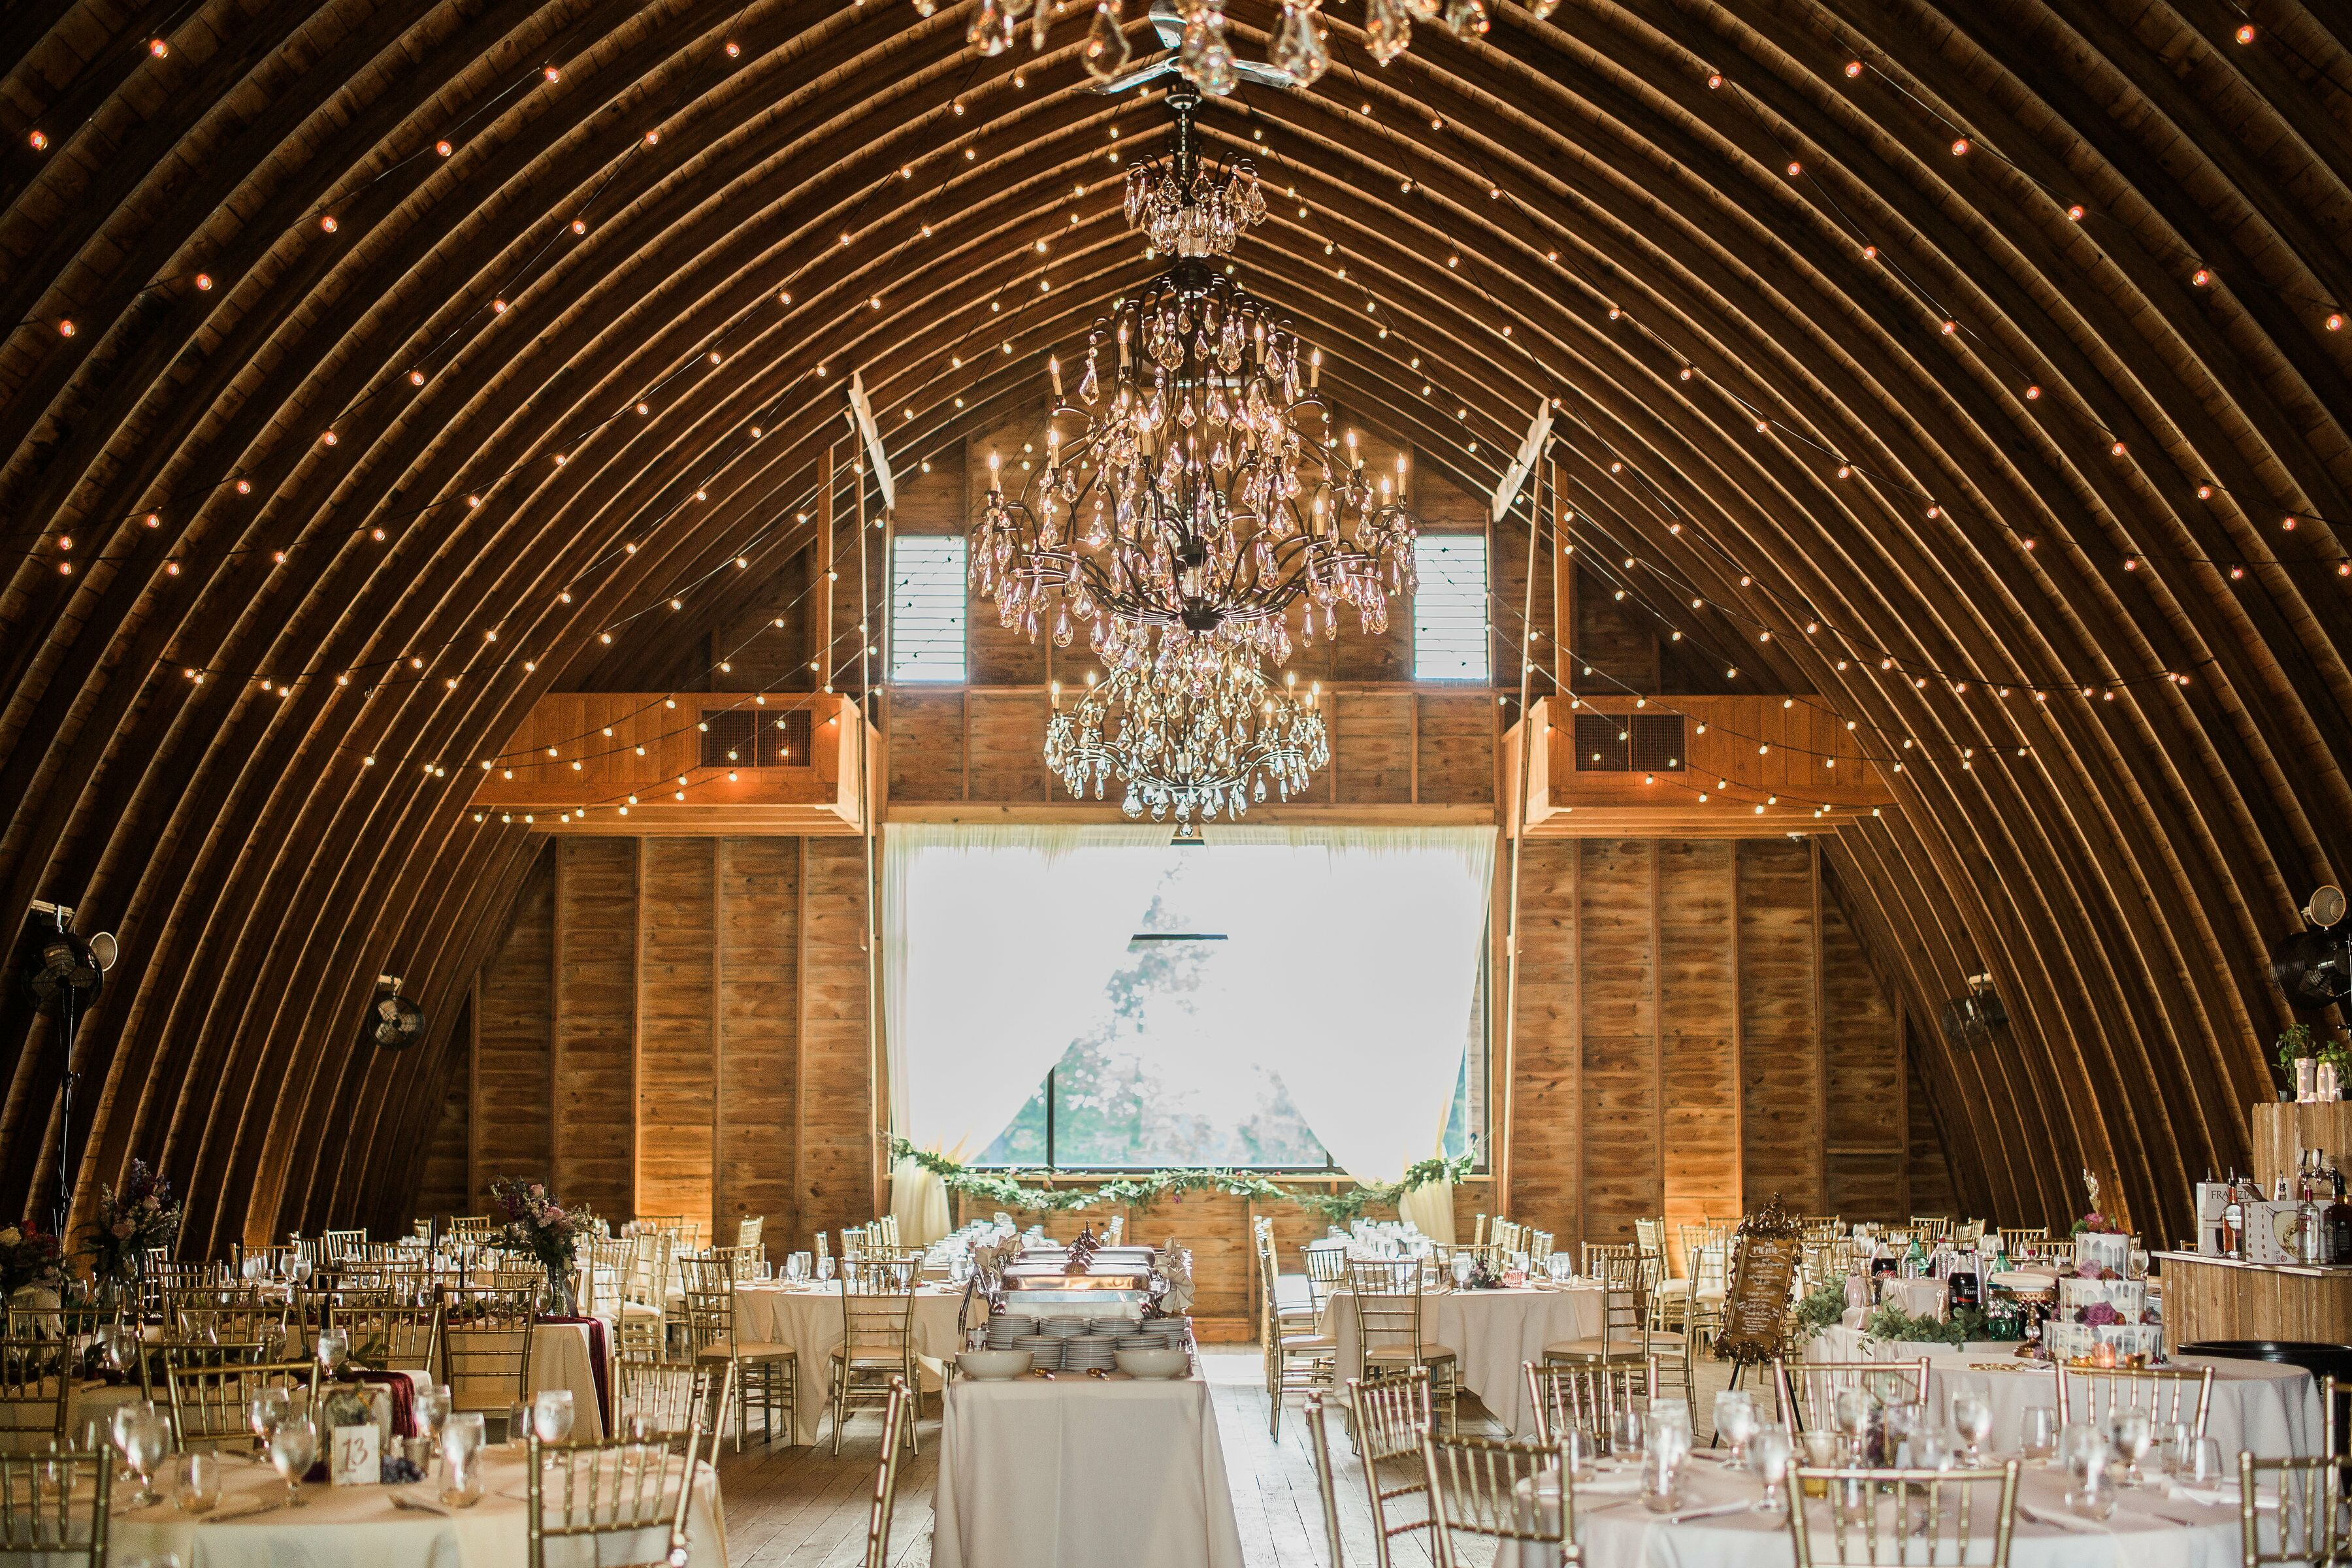 Irons Mill Farmstead Reception Venues New Wilmington Pa